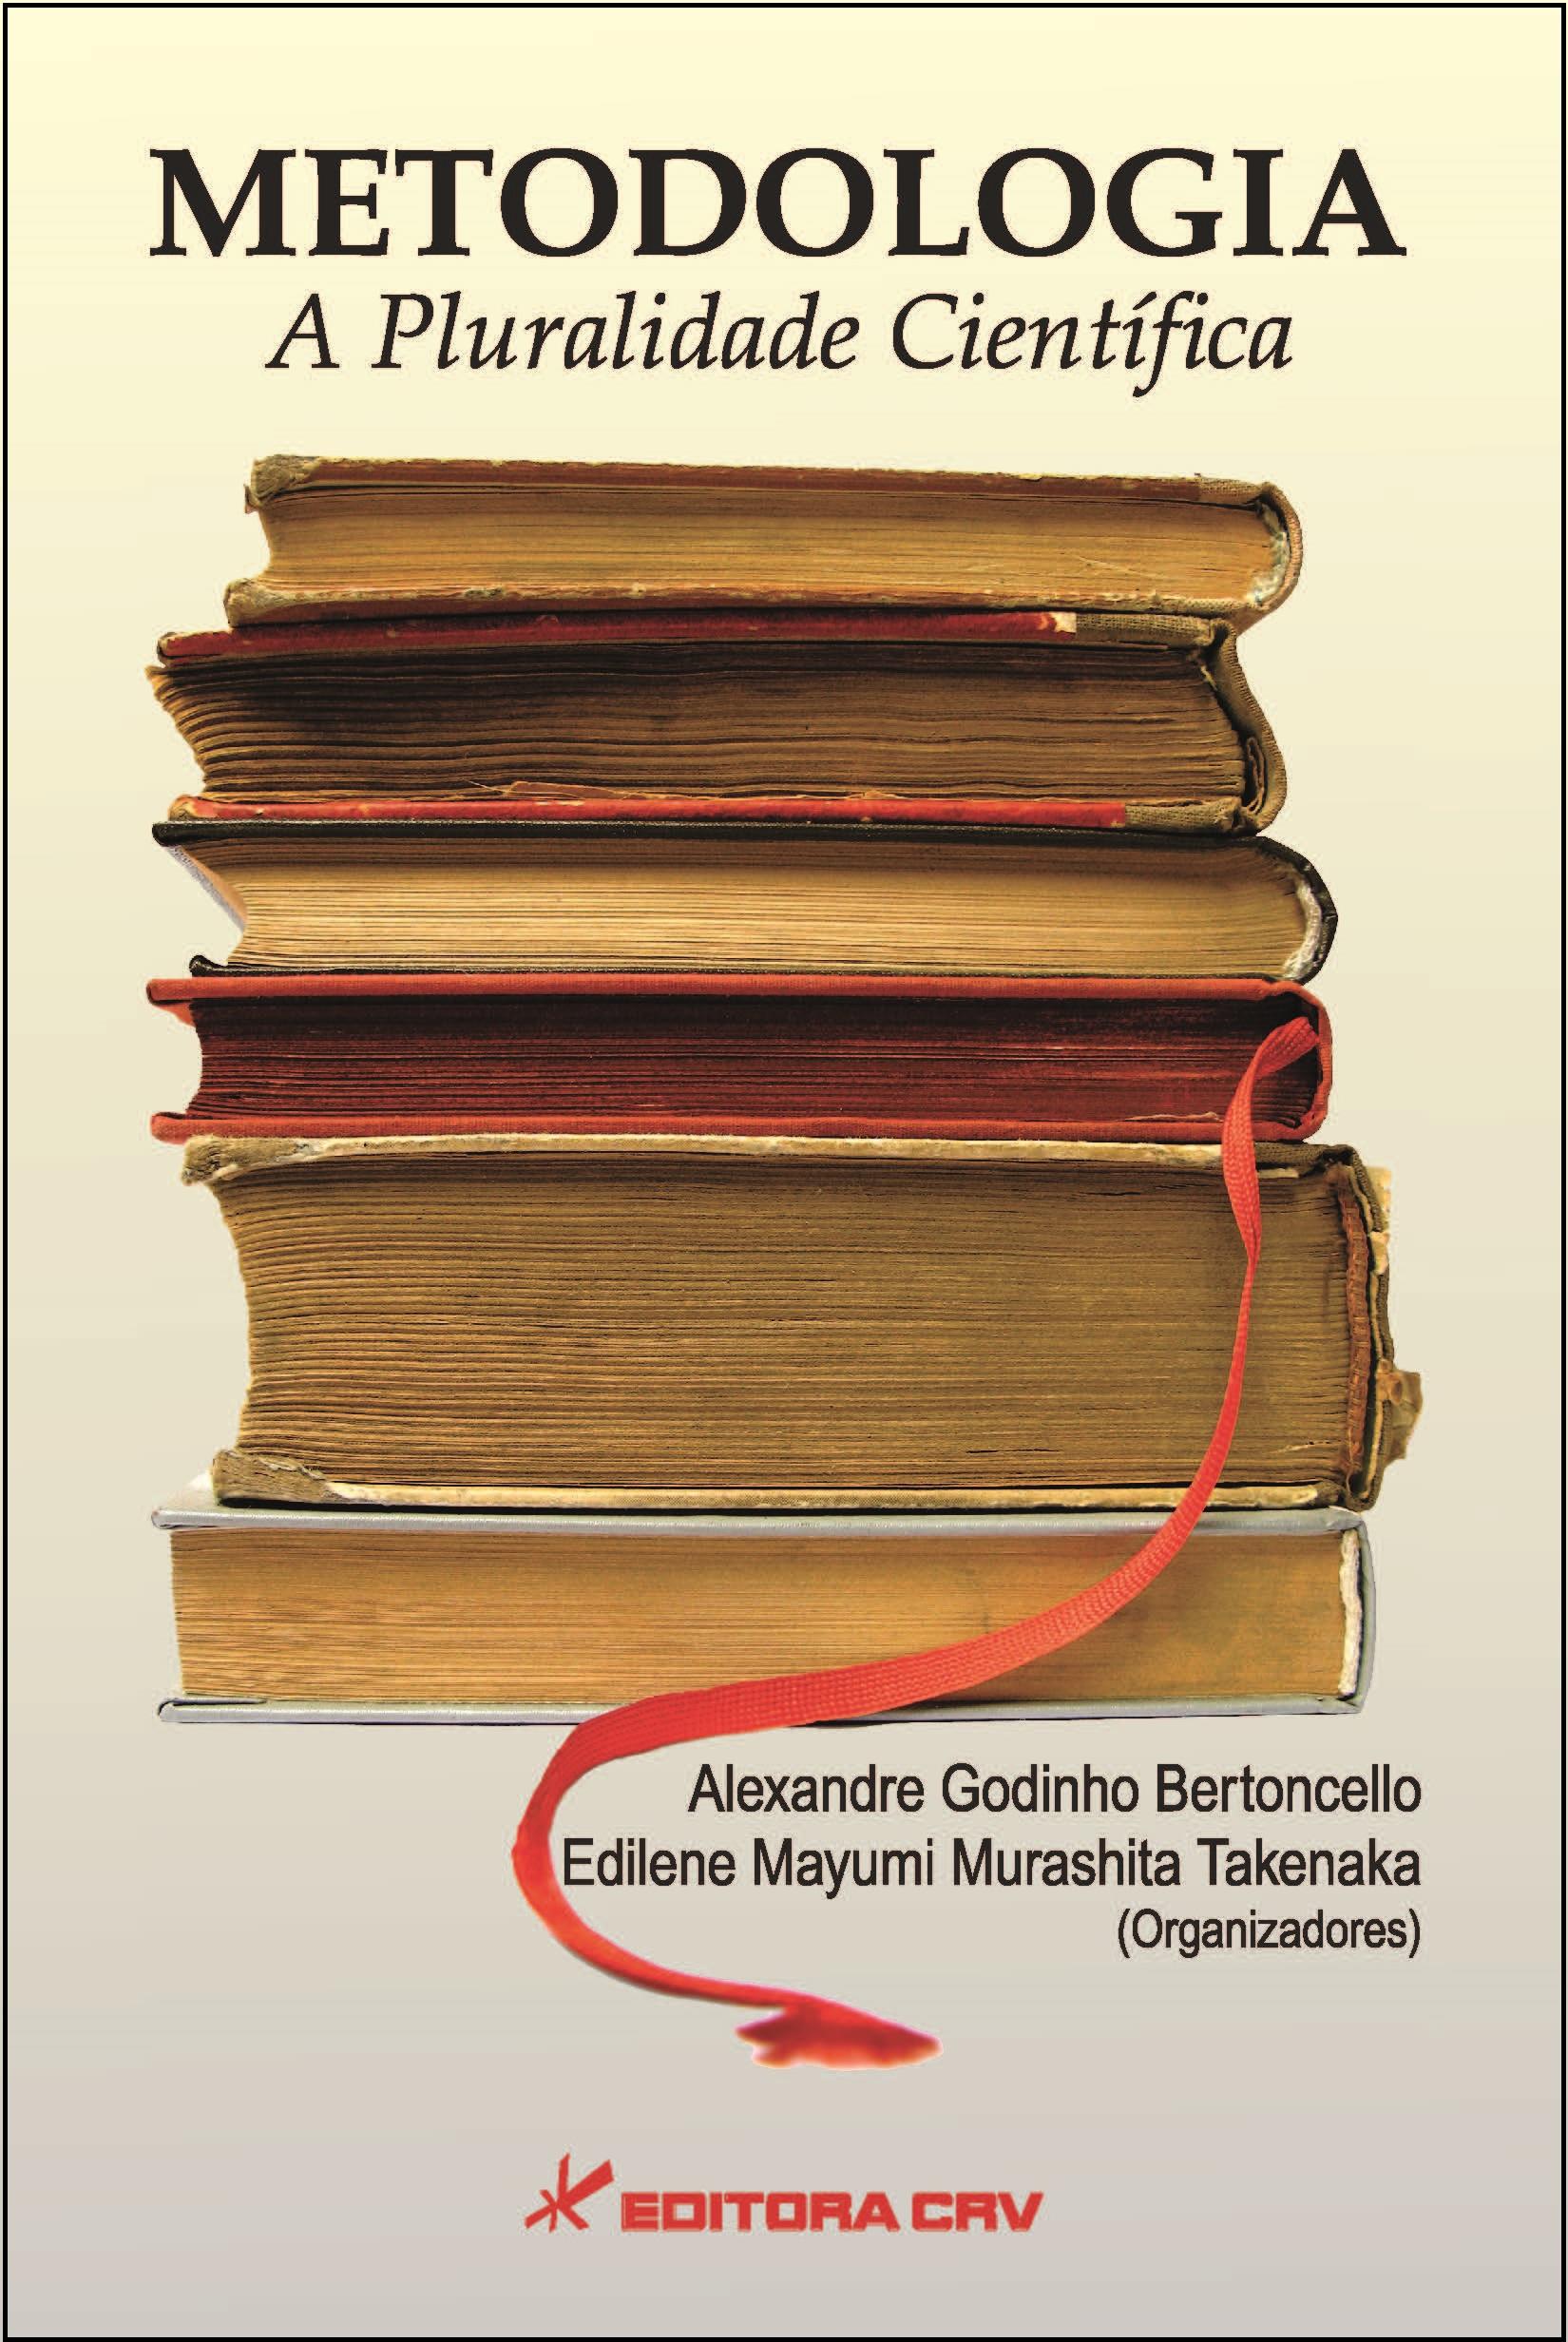 Capa do livro: METODOLOGIA:<br> a pluralidade científica